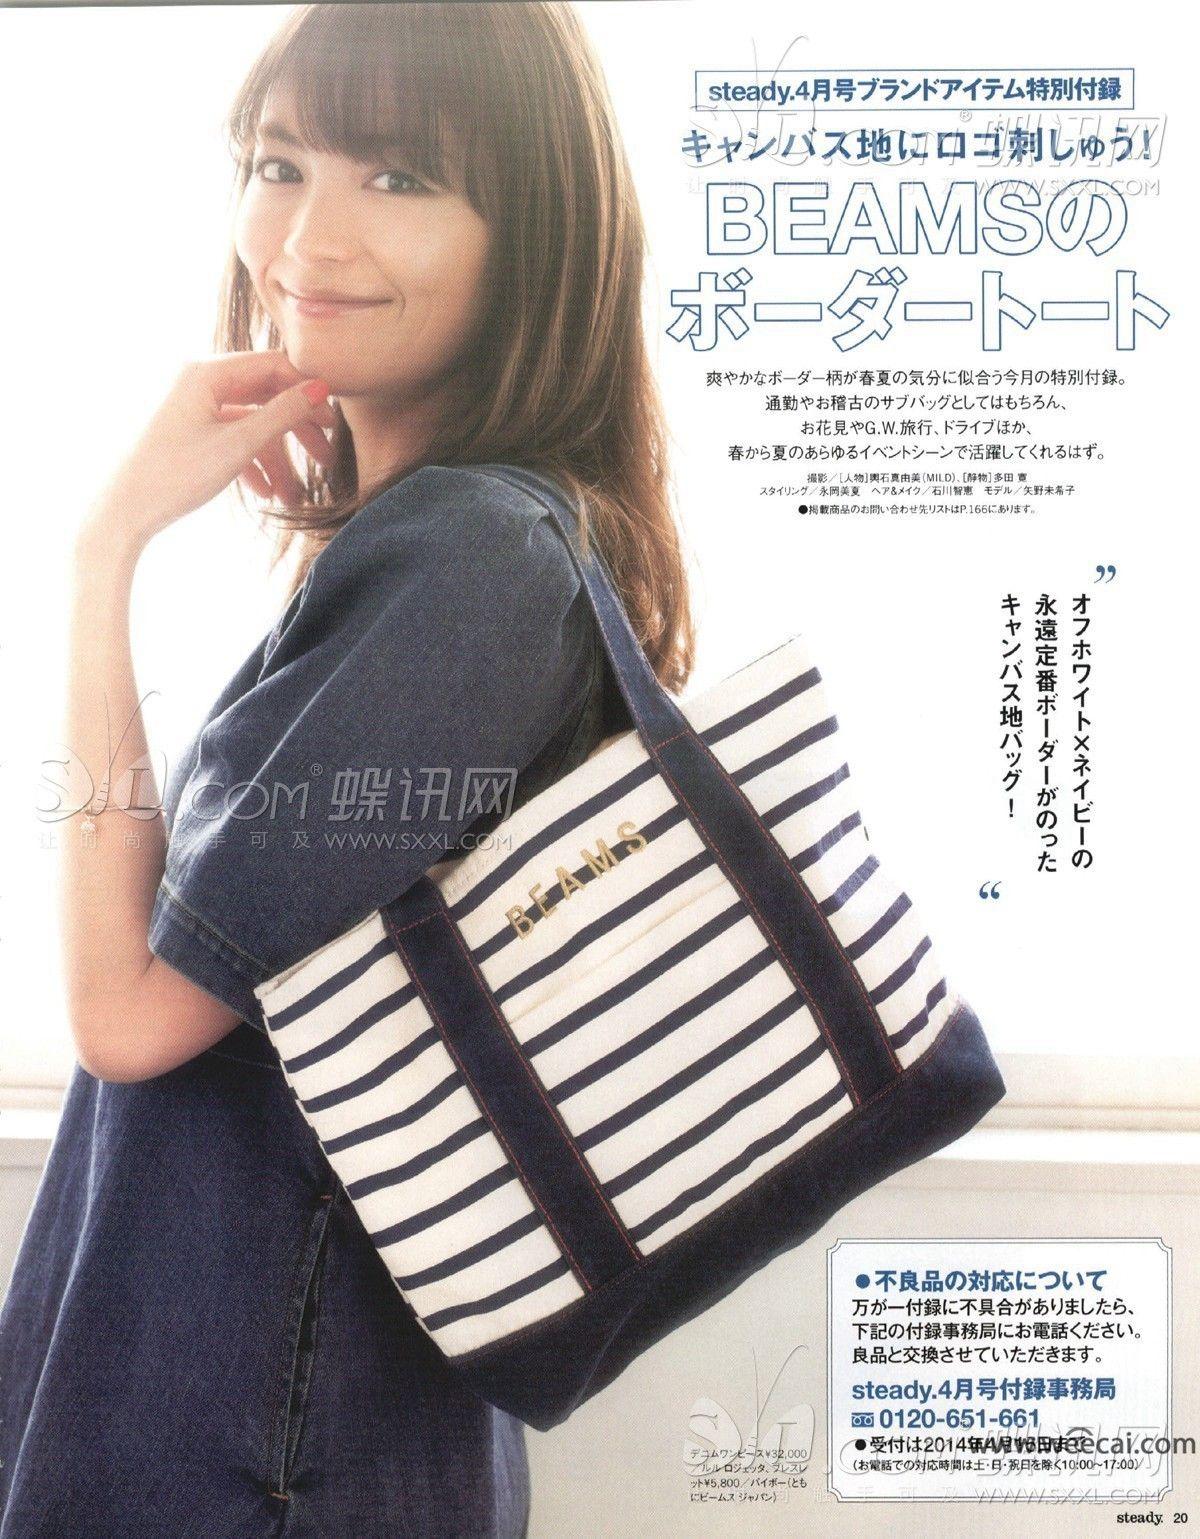 Stripy bag Korean hairstyle, Fashion makeup, Bags